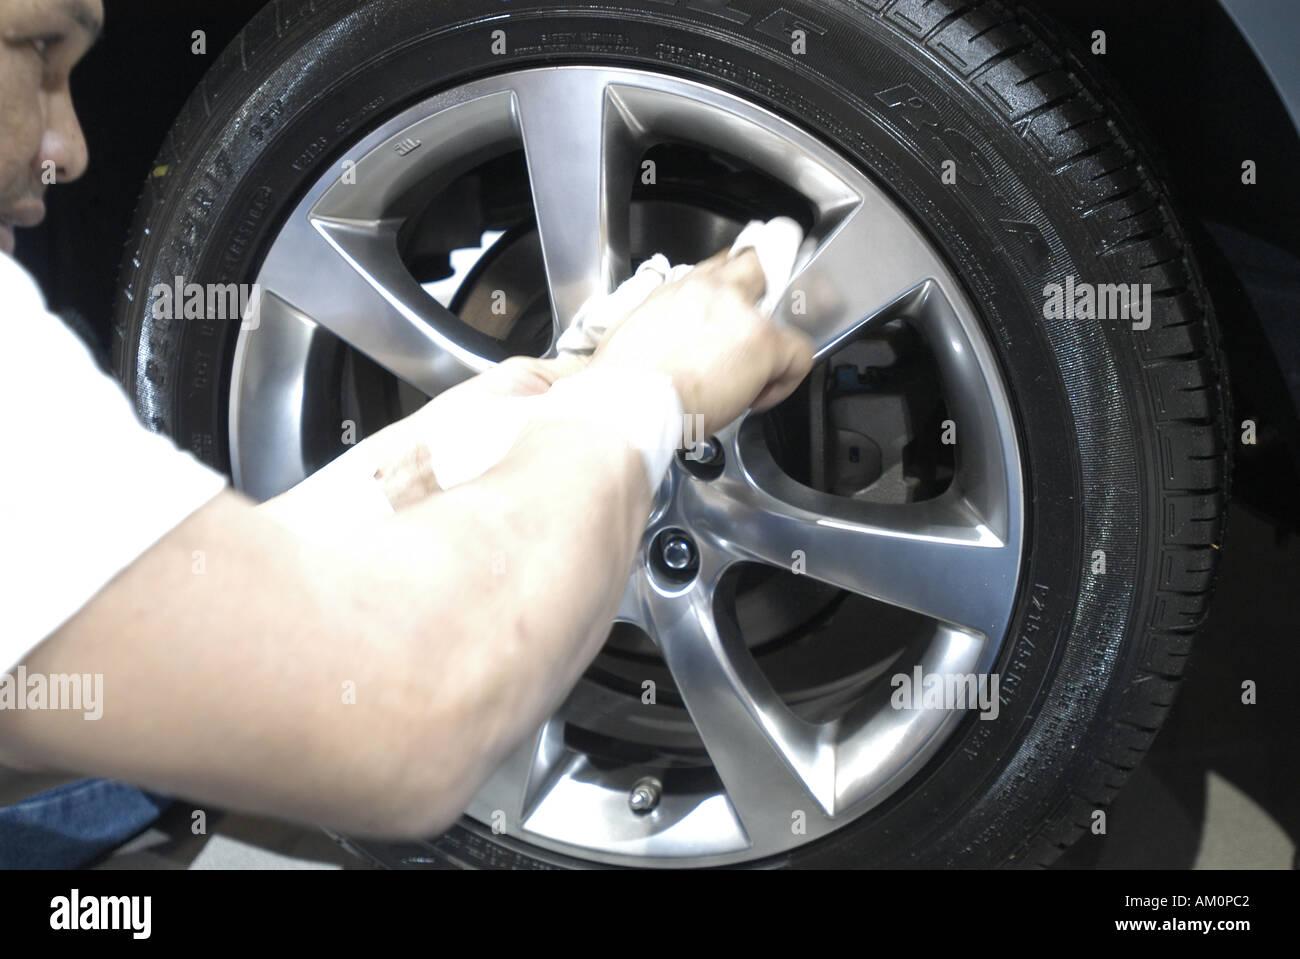 Tolle Cadillac Draht Radkappen Ideen - Der Schaltplan - triangre.info